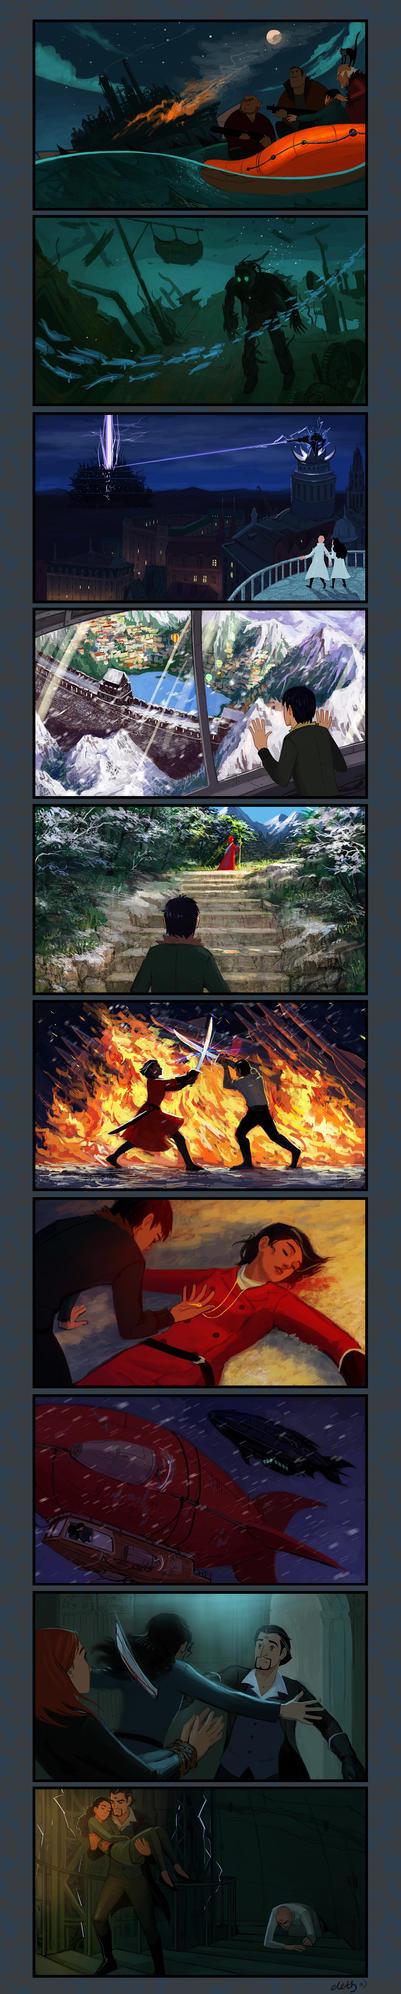 Mortal Engines explication III by eleth-art